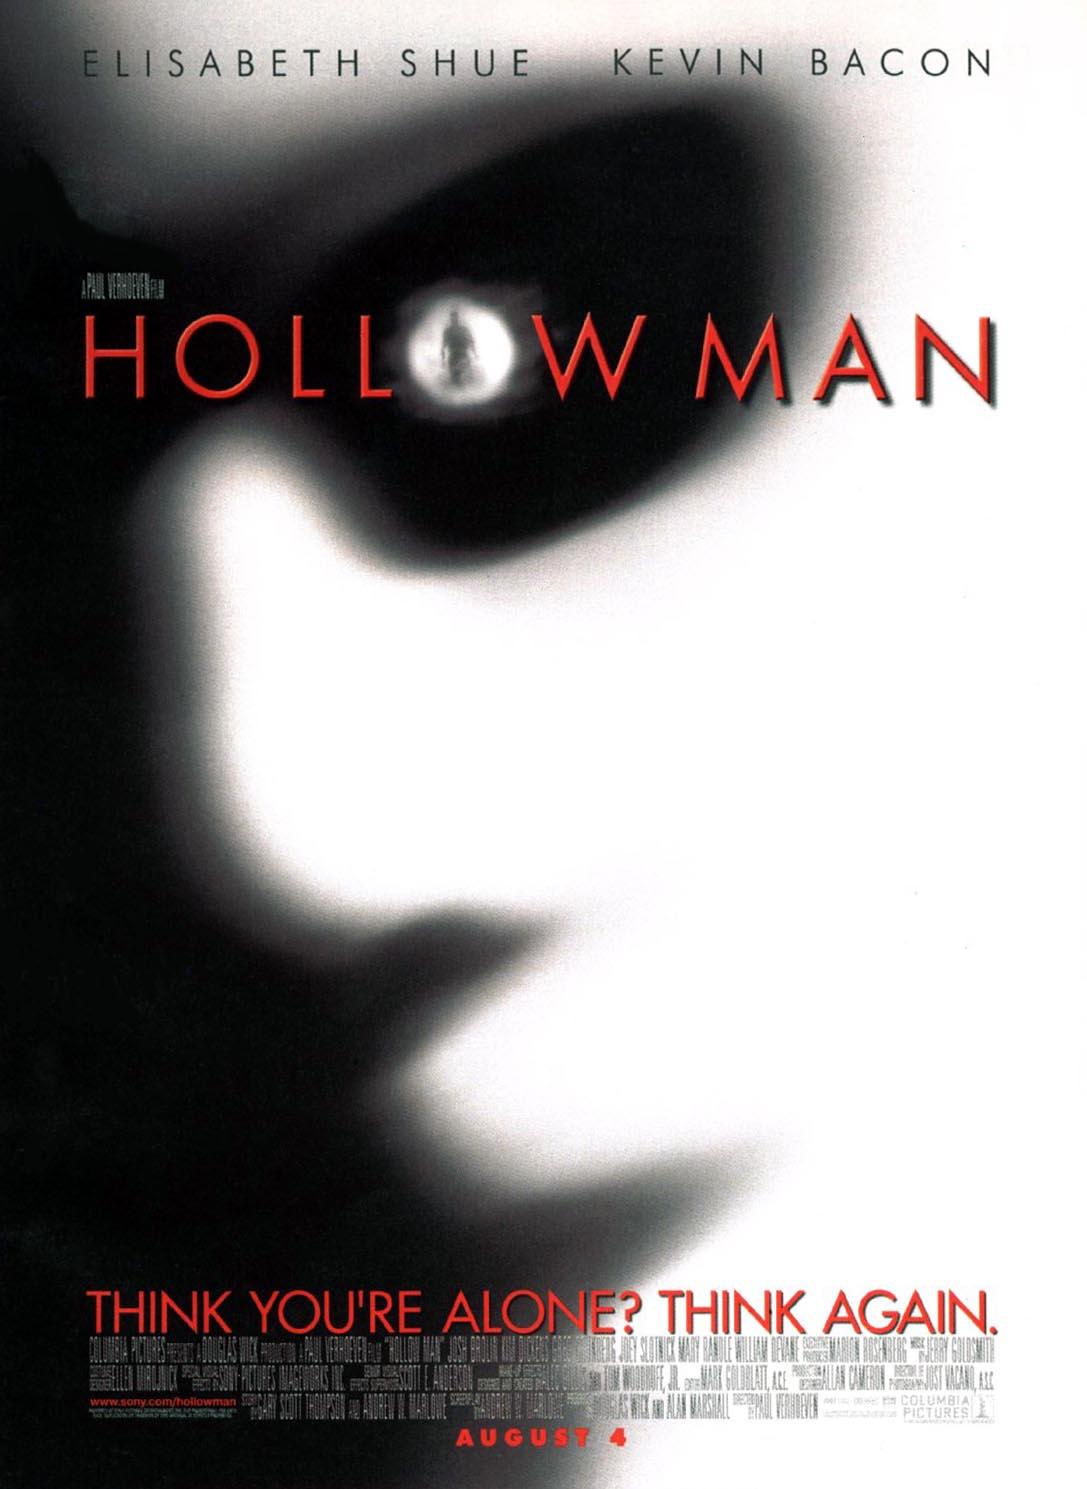 Hollow Man (2000) - Bioskop Warnet Palapa